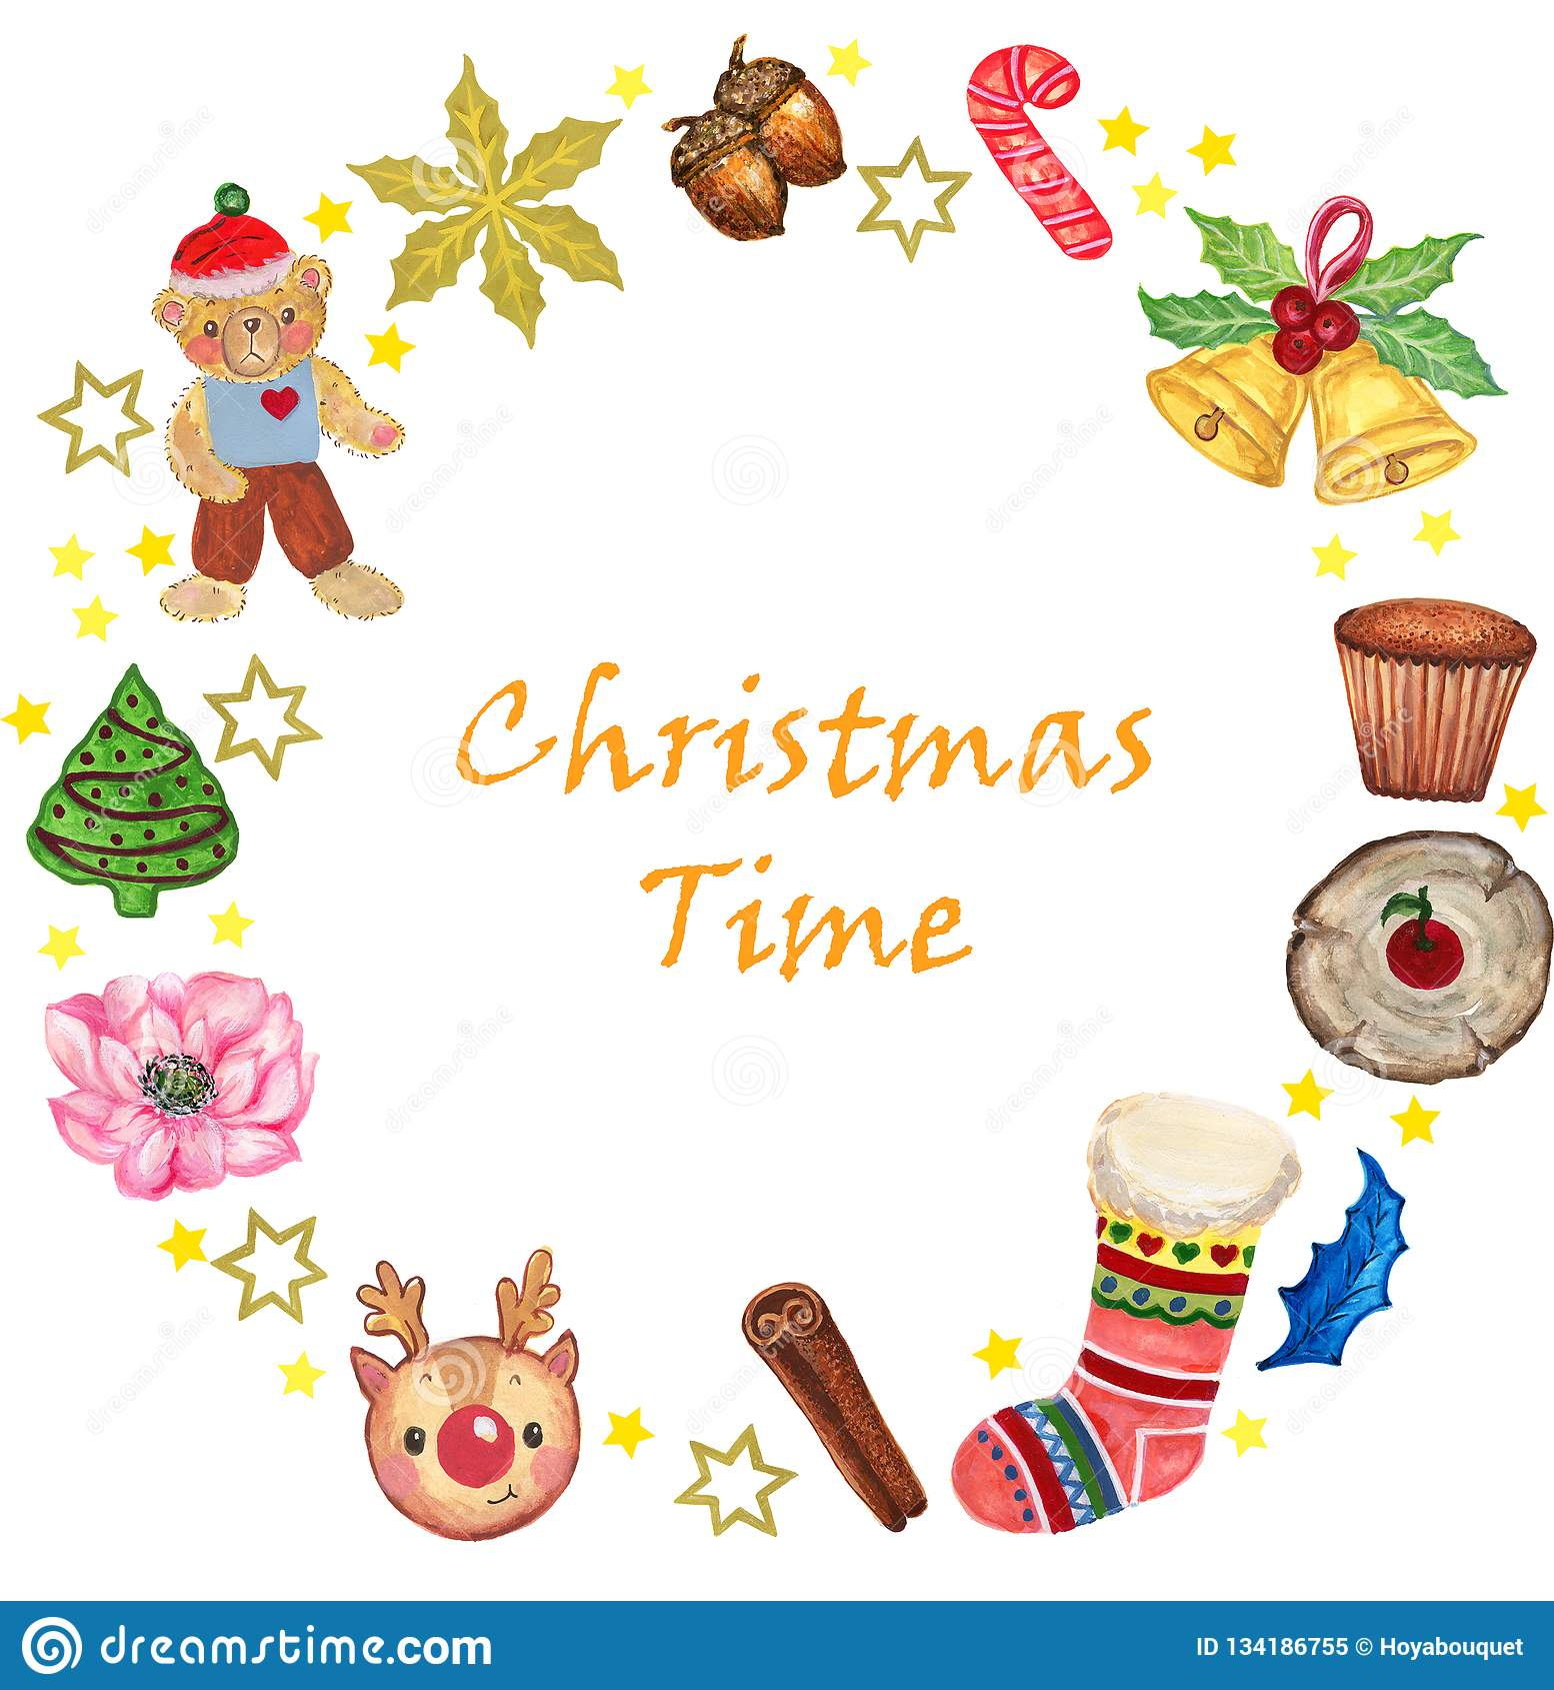 28 Christmas Cupcakes: Christmas Cupcake Recipes